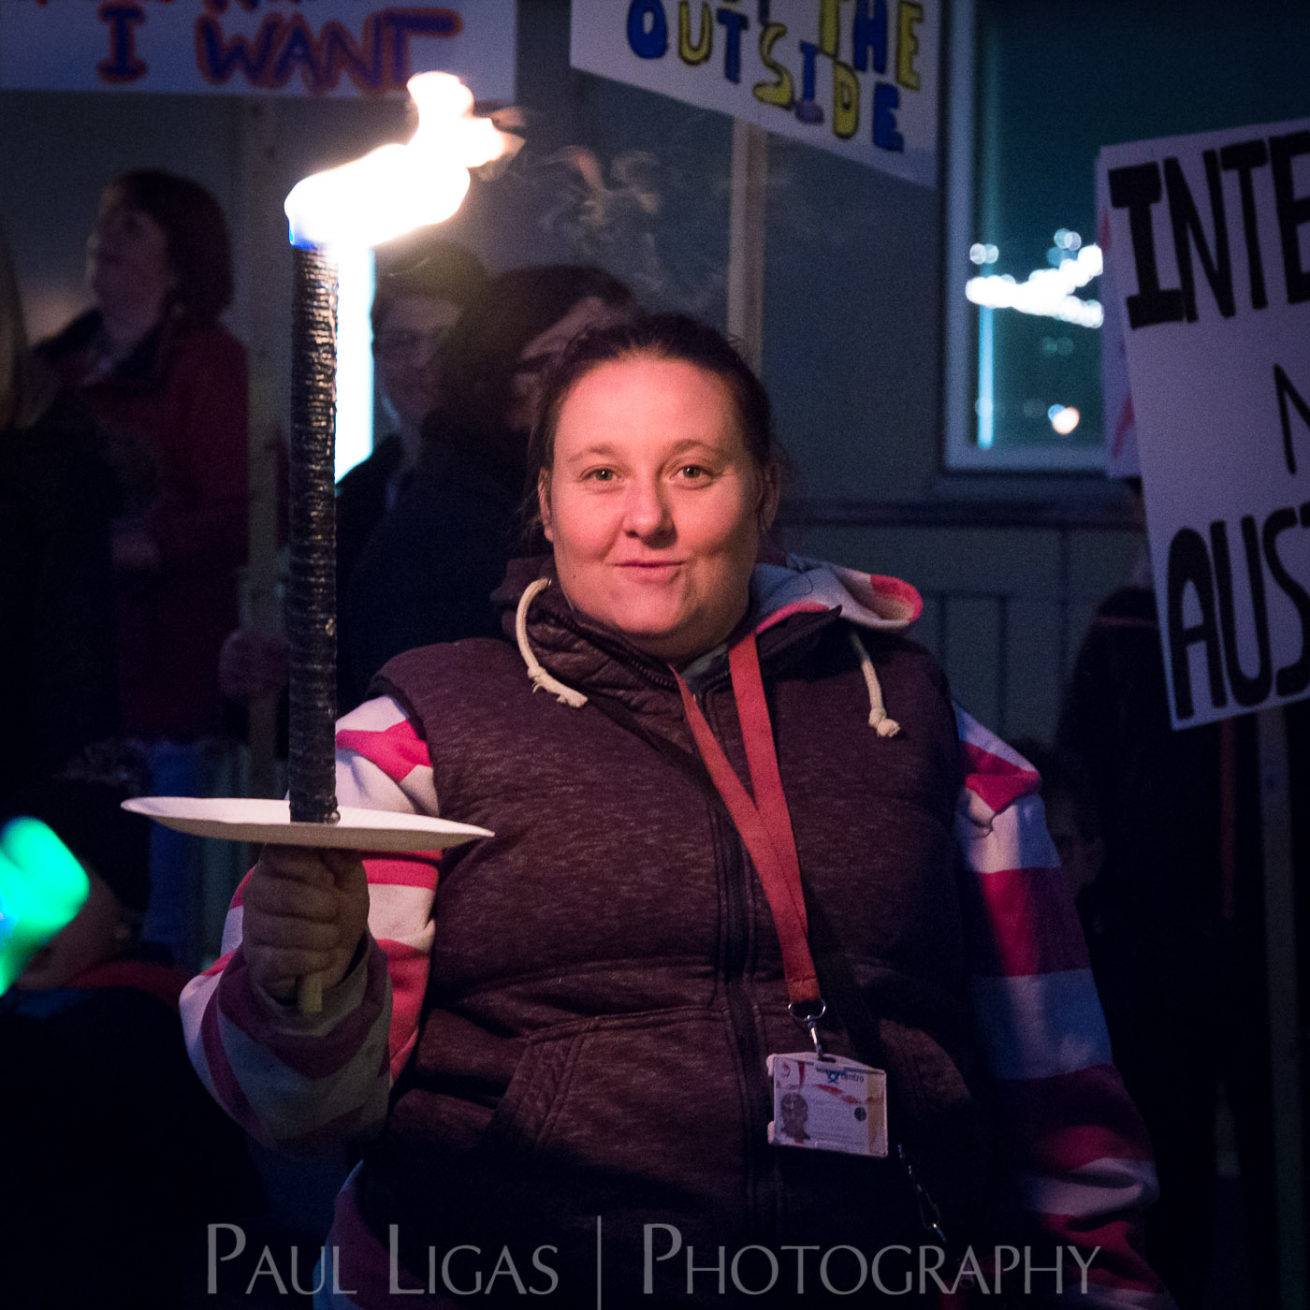 Longbridge Light Festival, Birmingham event photographer herefordshire photography portrait 3936